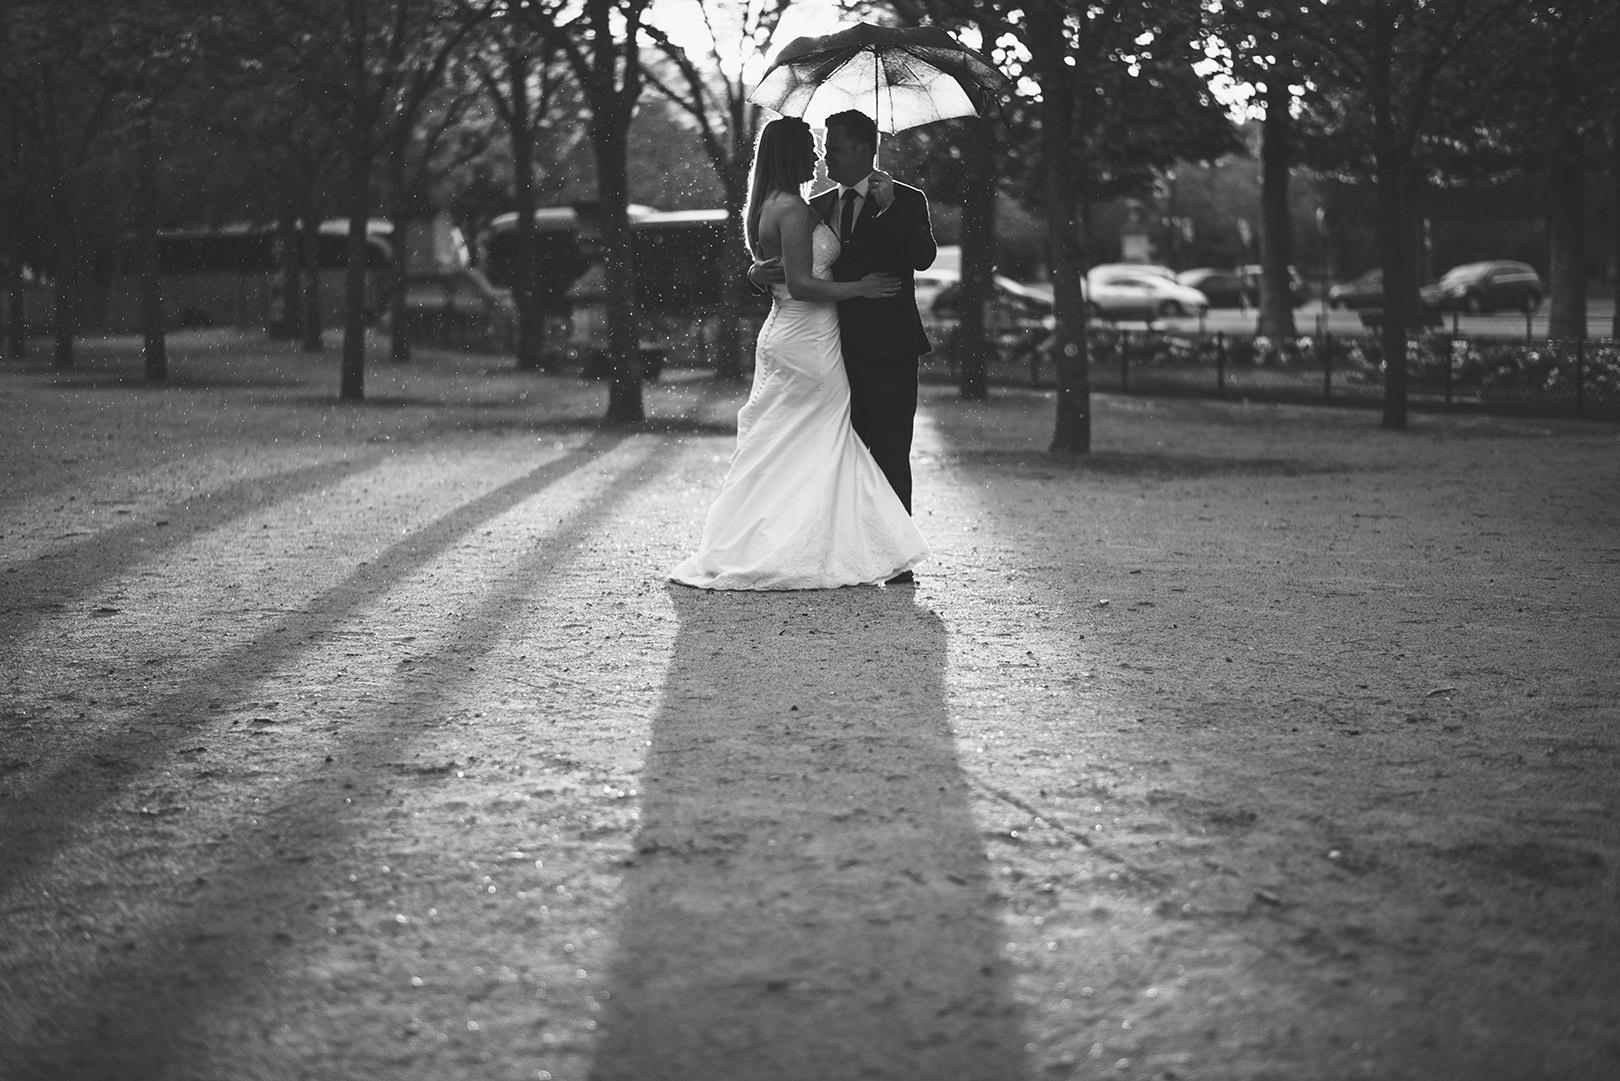 rainy wedding photography Paris